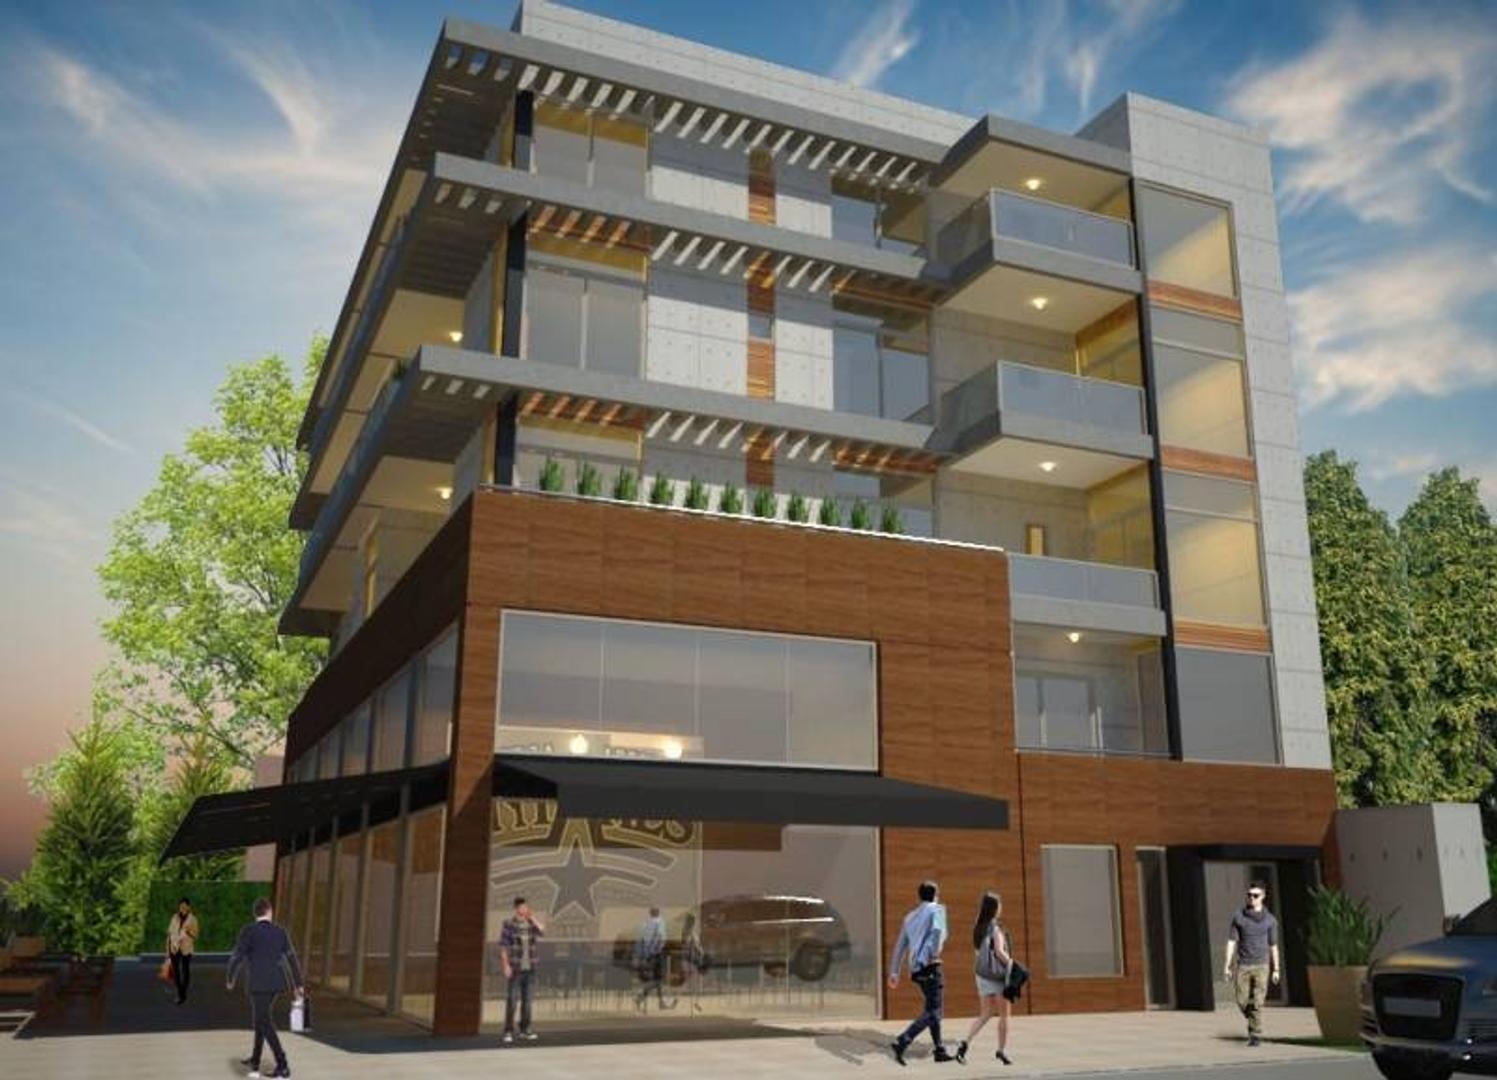 Excelente desarrollo para inversión Moreno Centro